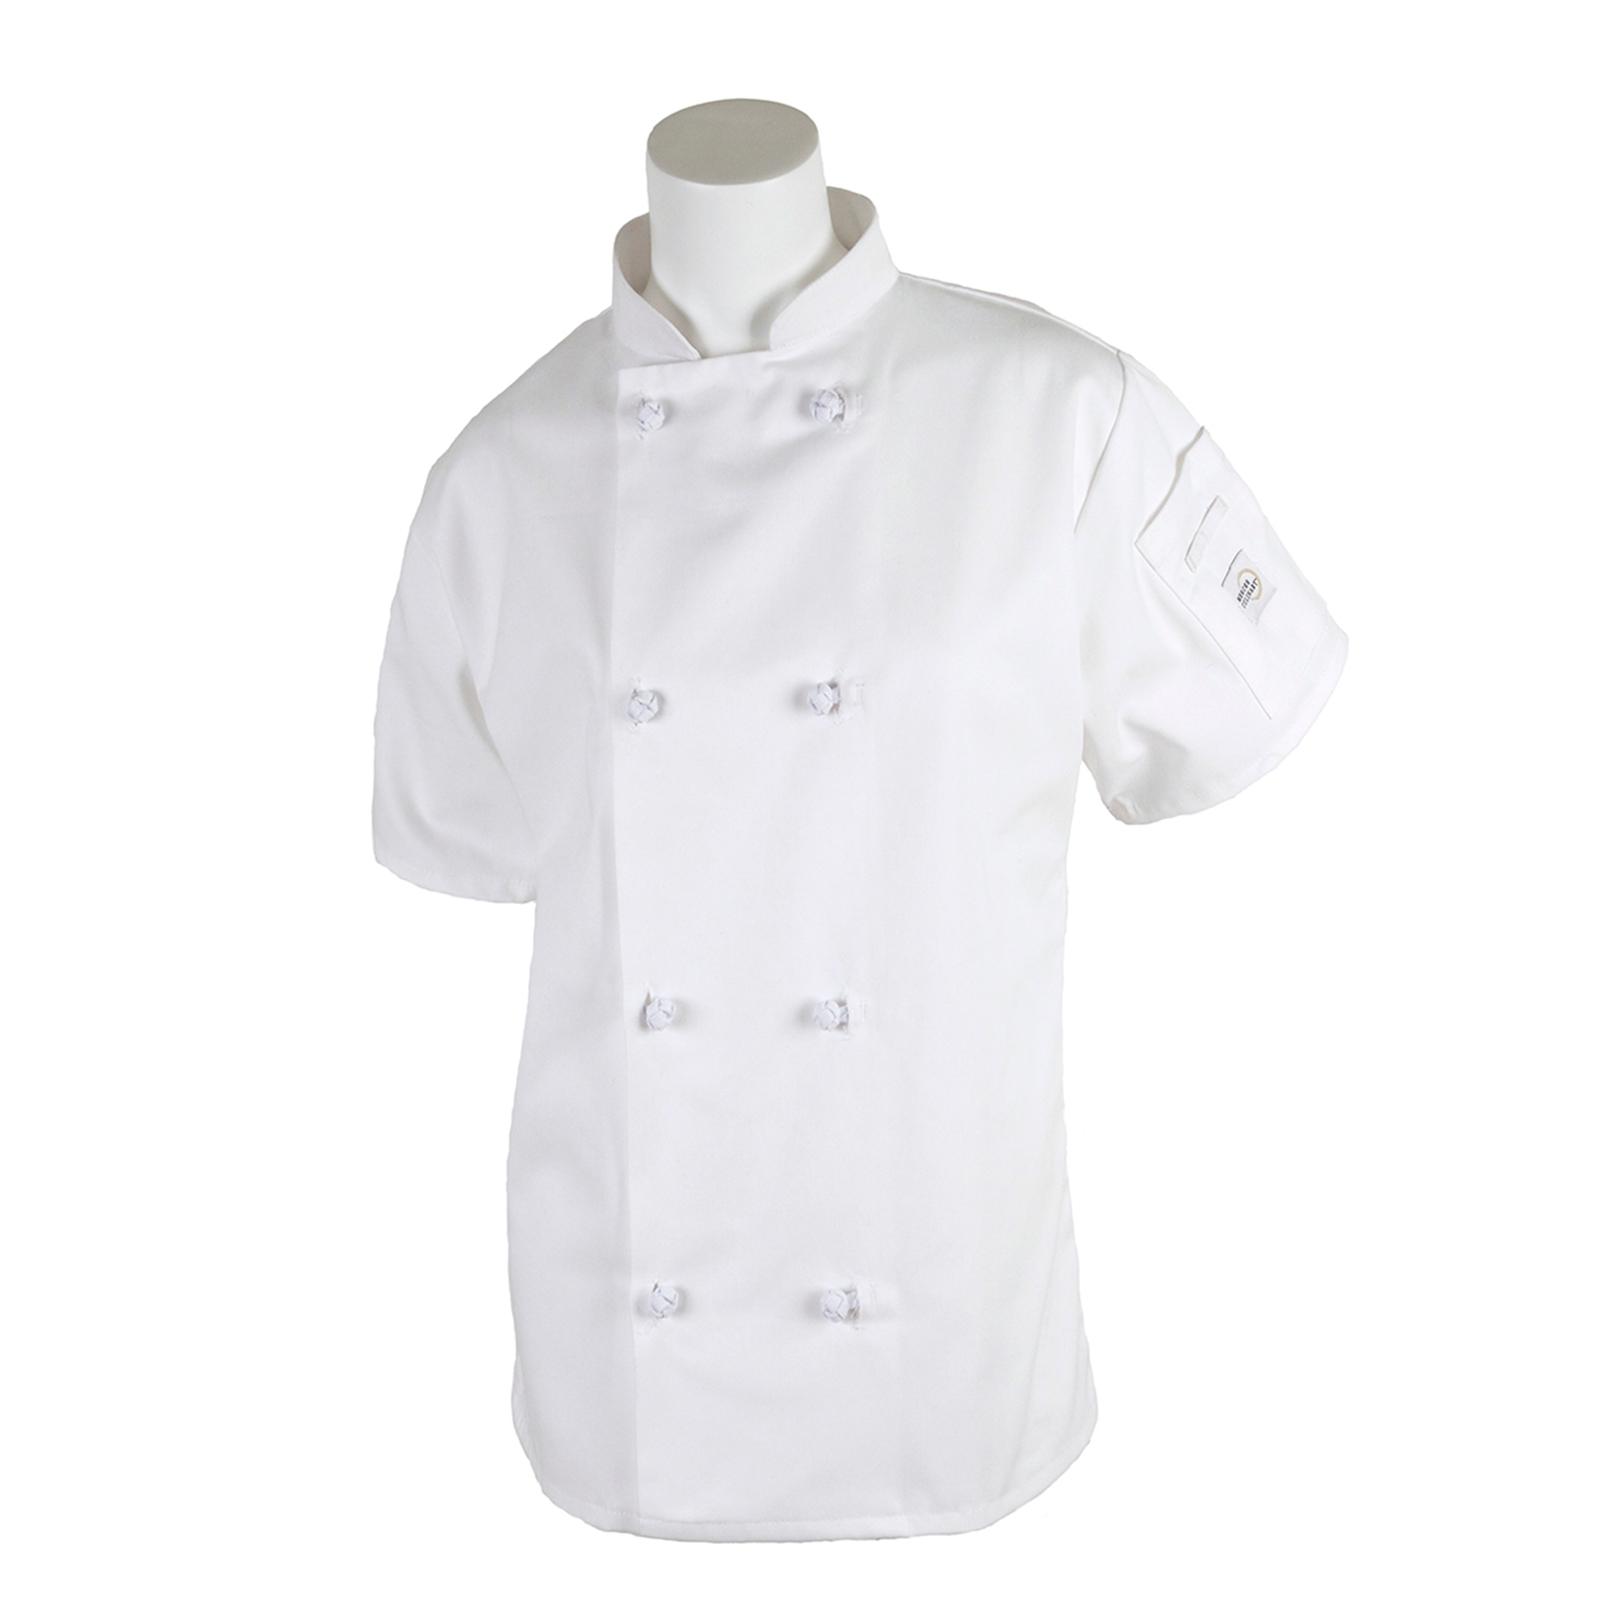 Mercer Culinary M60024WHXXS chef's coat